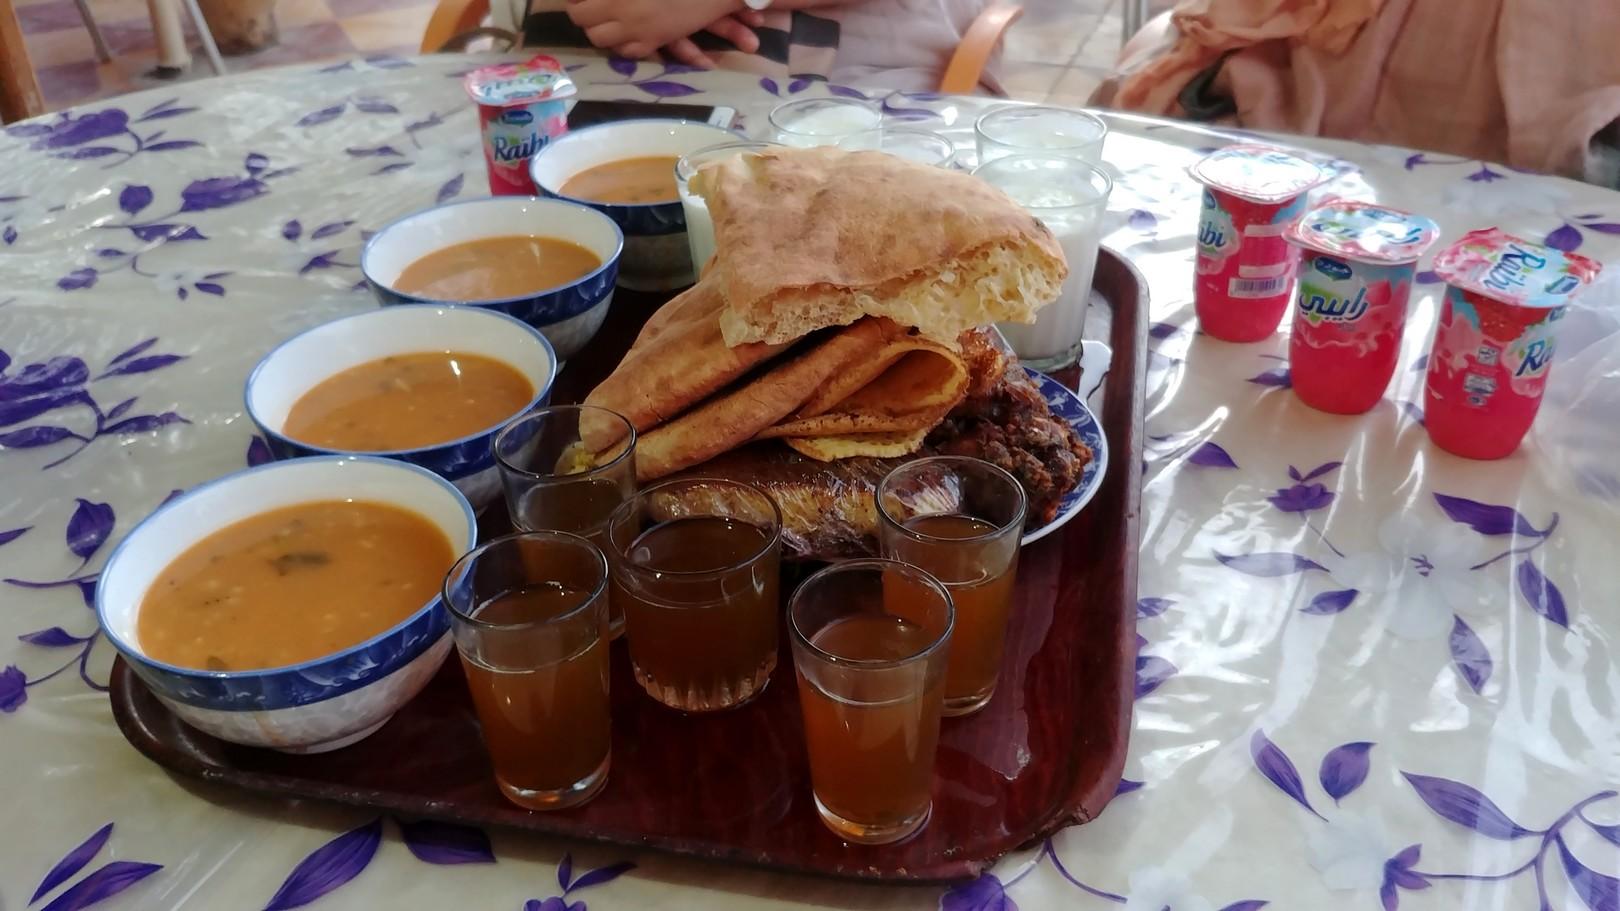 Maroc - Repas du ftour / rupture du jeûne, avec Mohamed